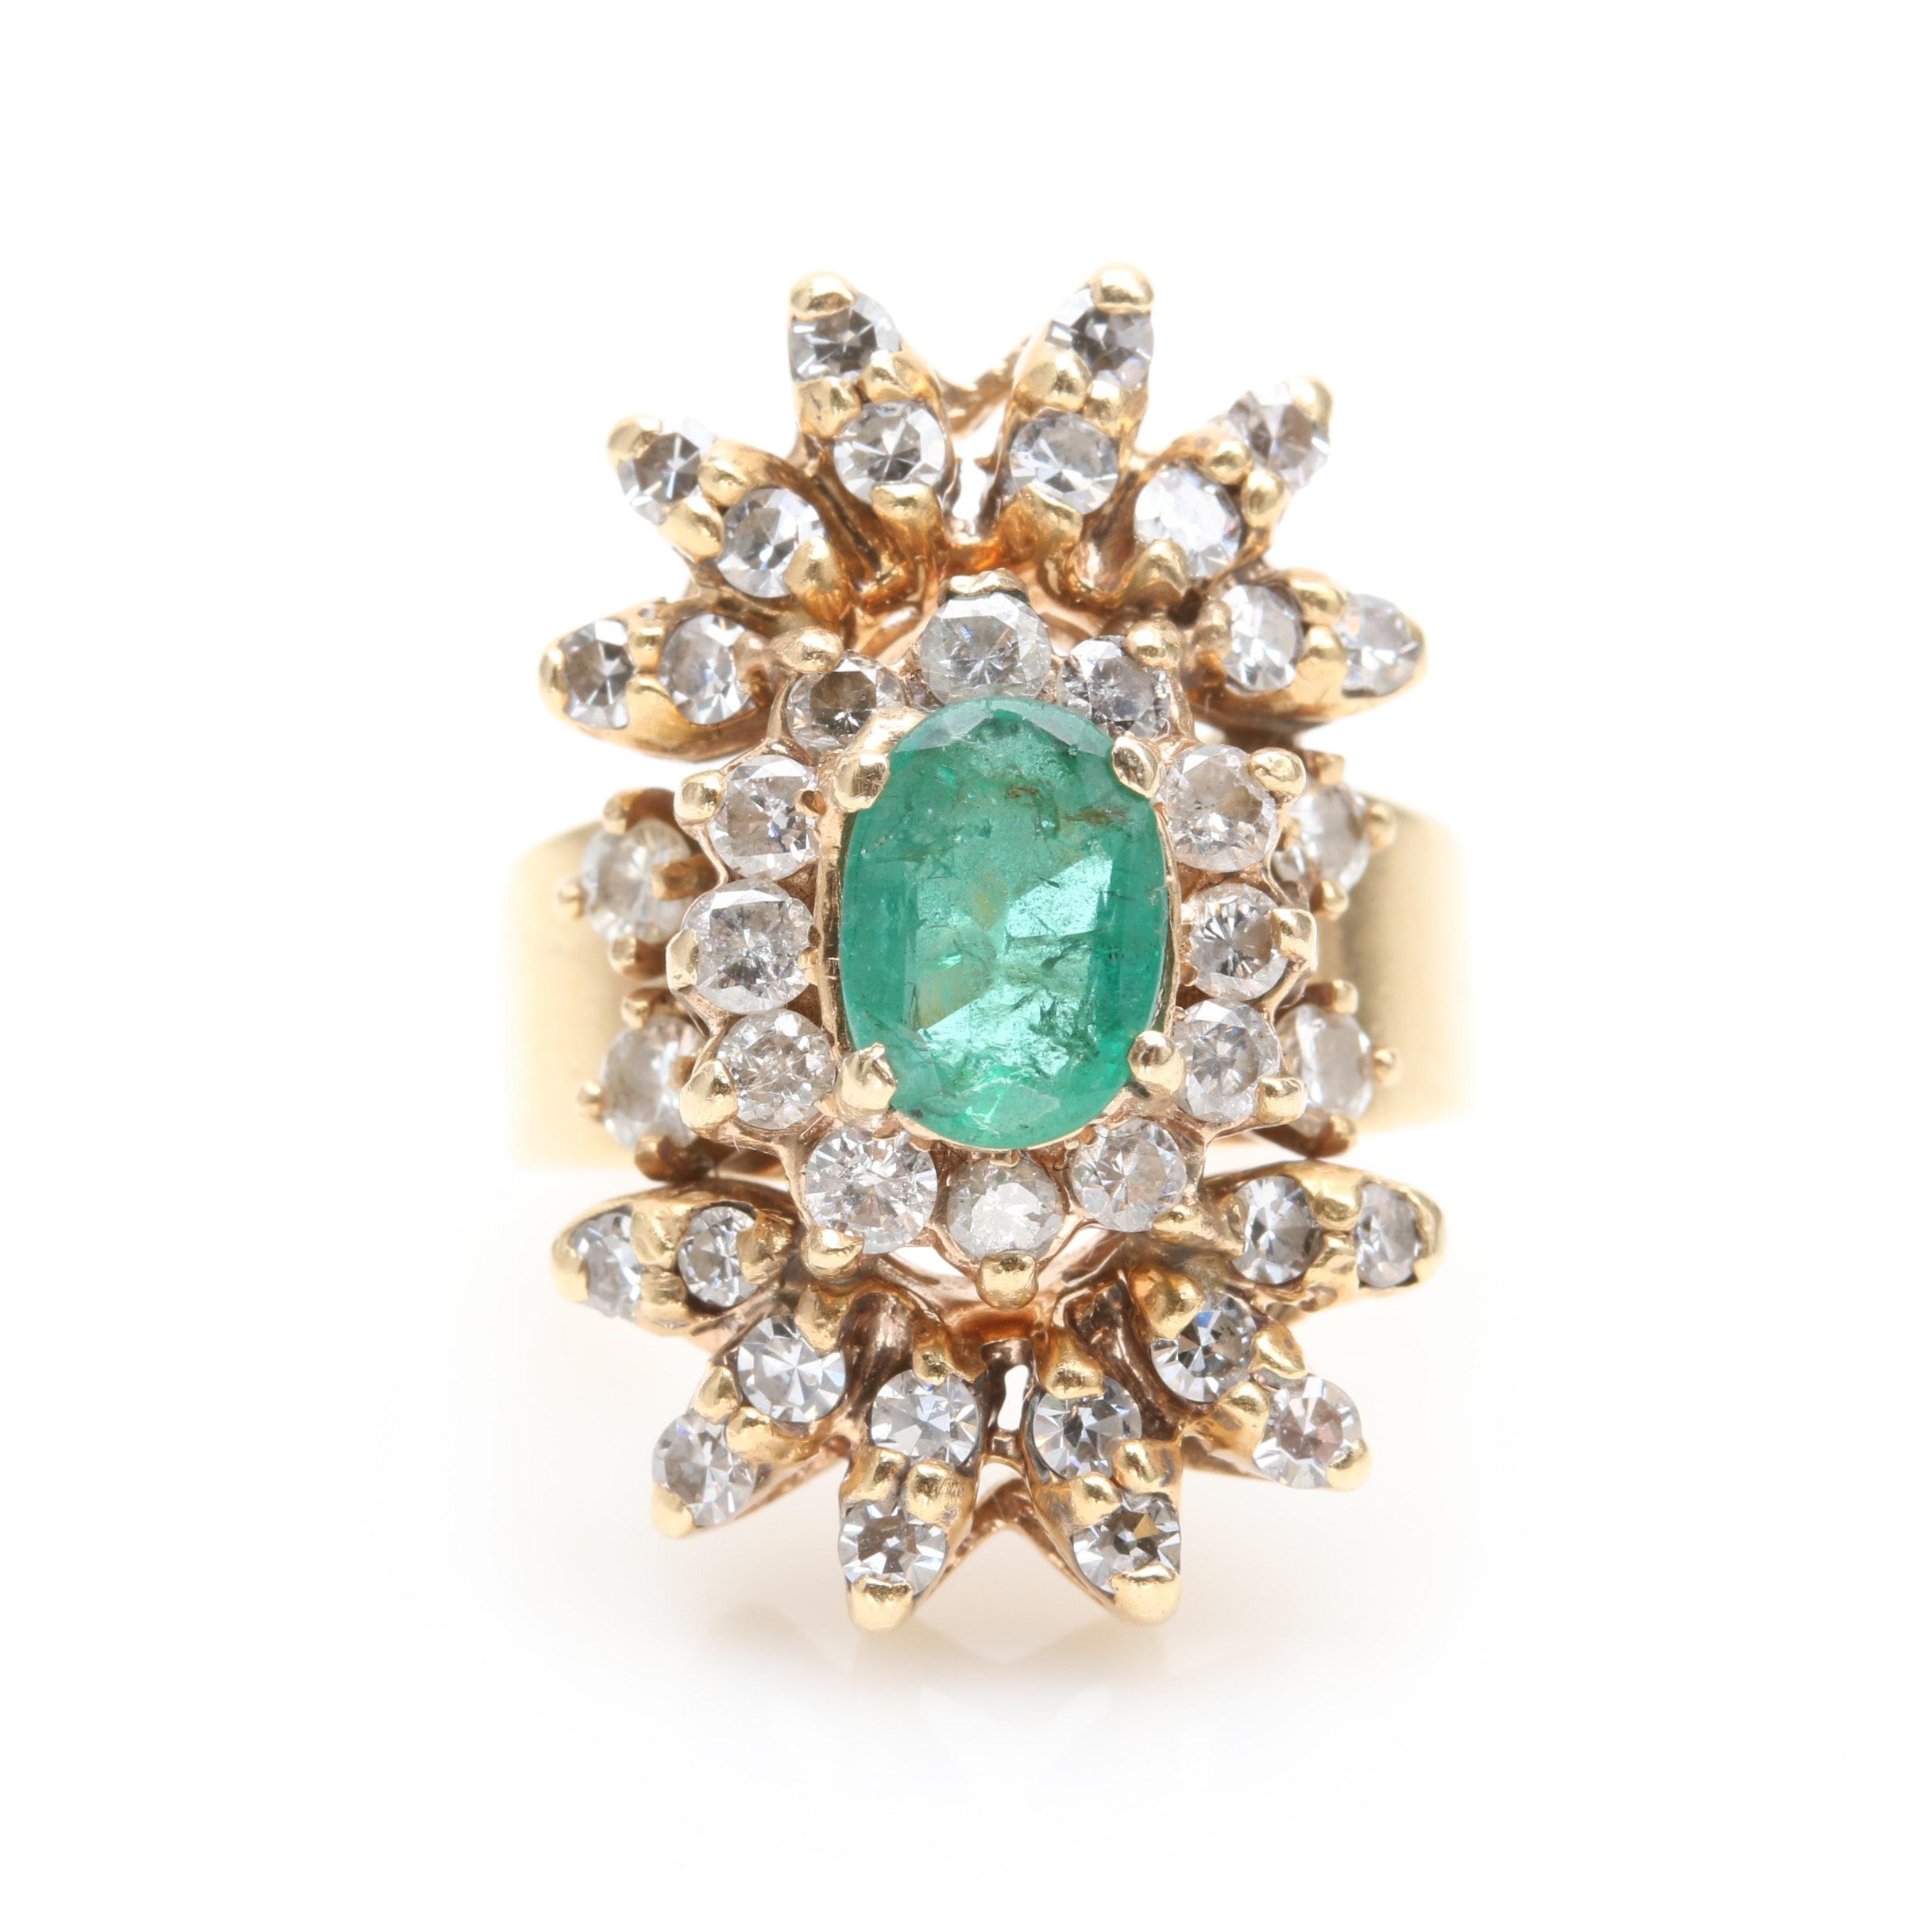 14K Yellow Gold Emerald and 1.12 CTW Diamond Ring